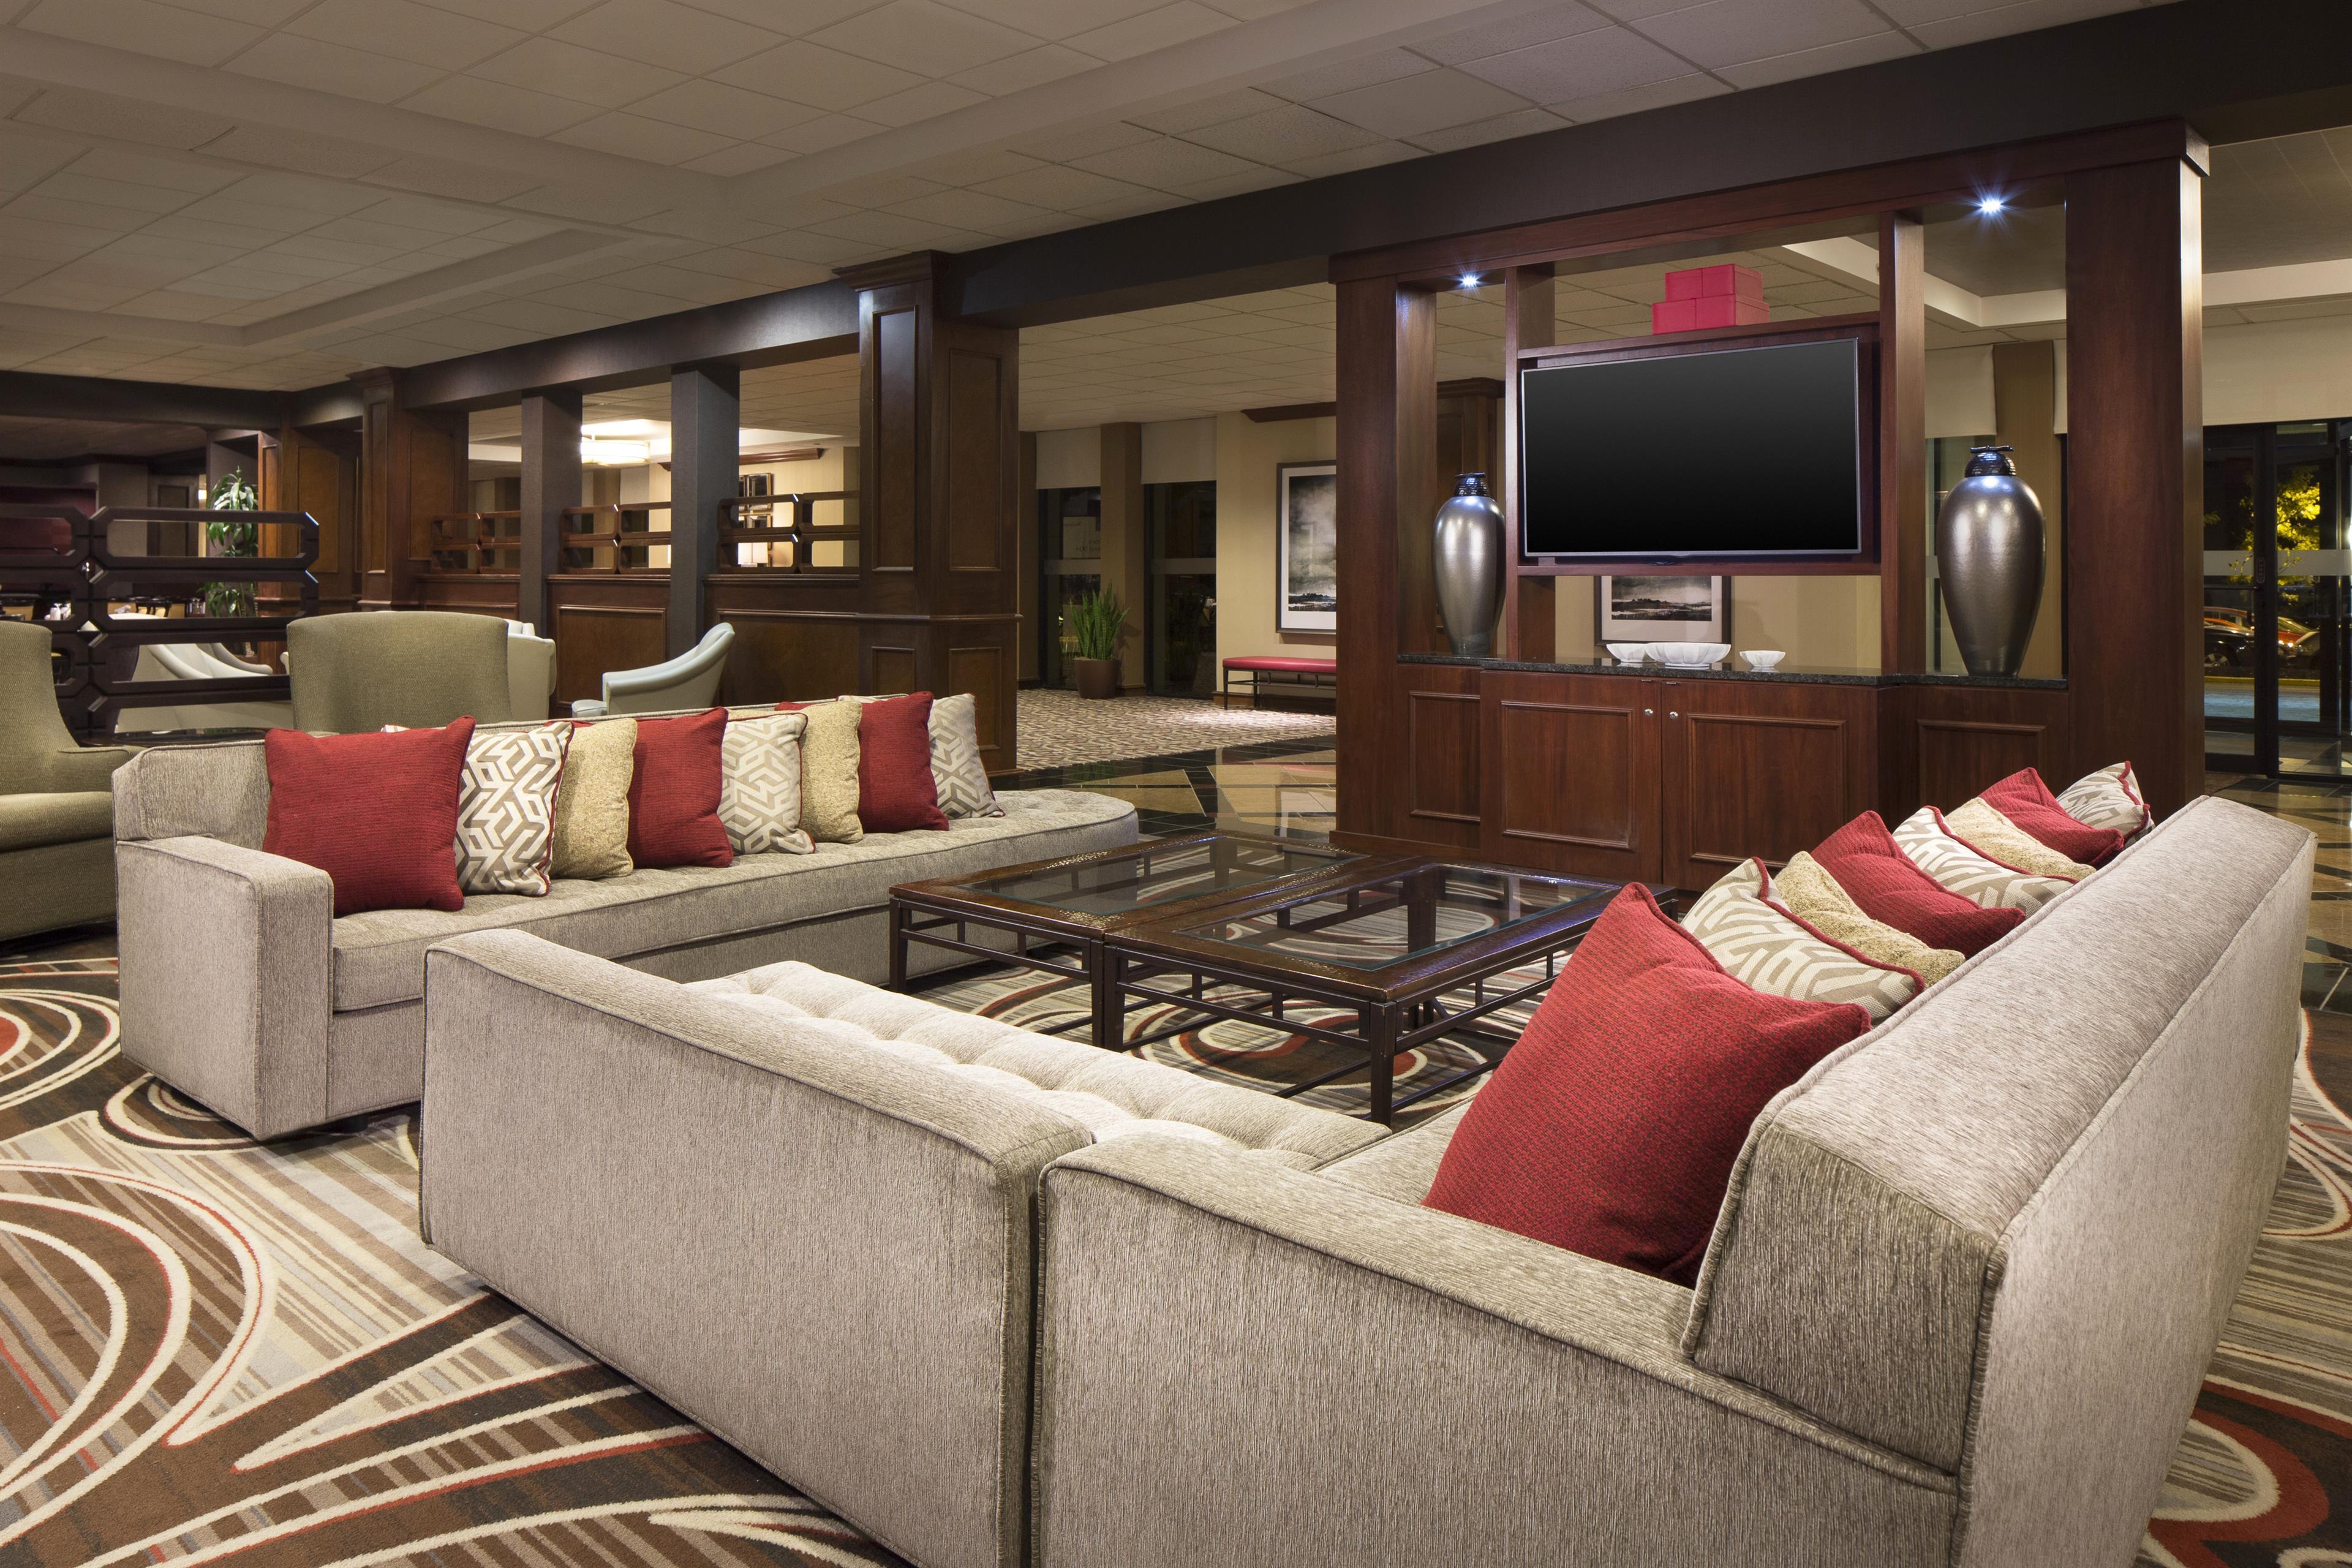 Sheraton Omaha Hotel image 25